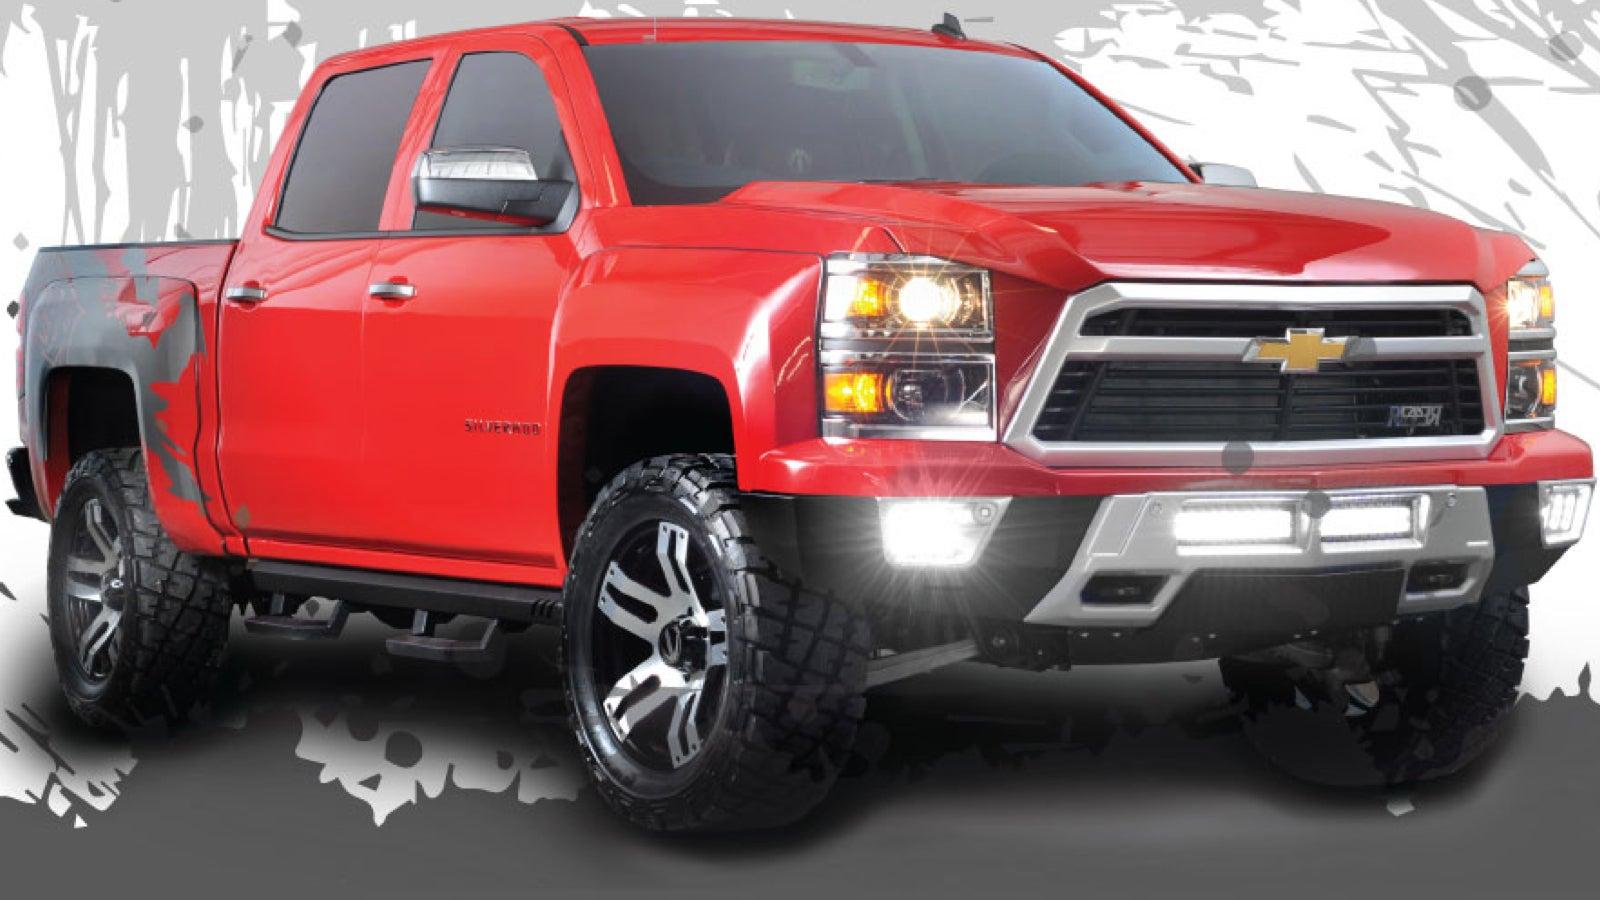 Is The Chevrolet Reaper A Real Raptor Killer Or Dealership